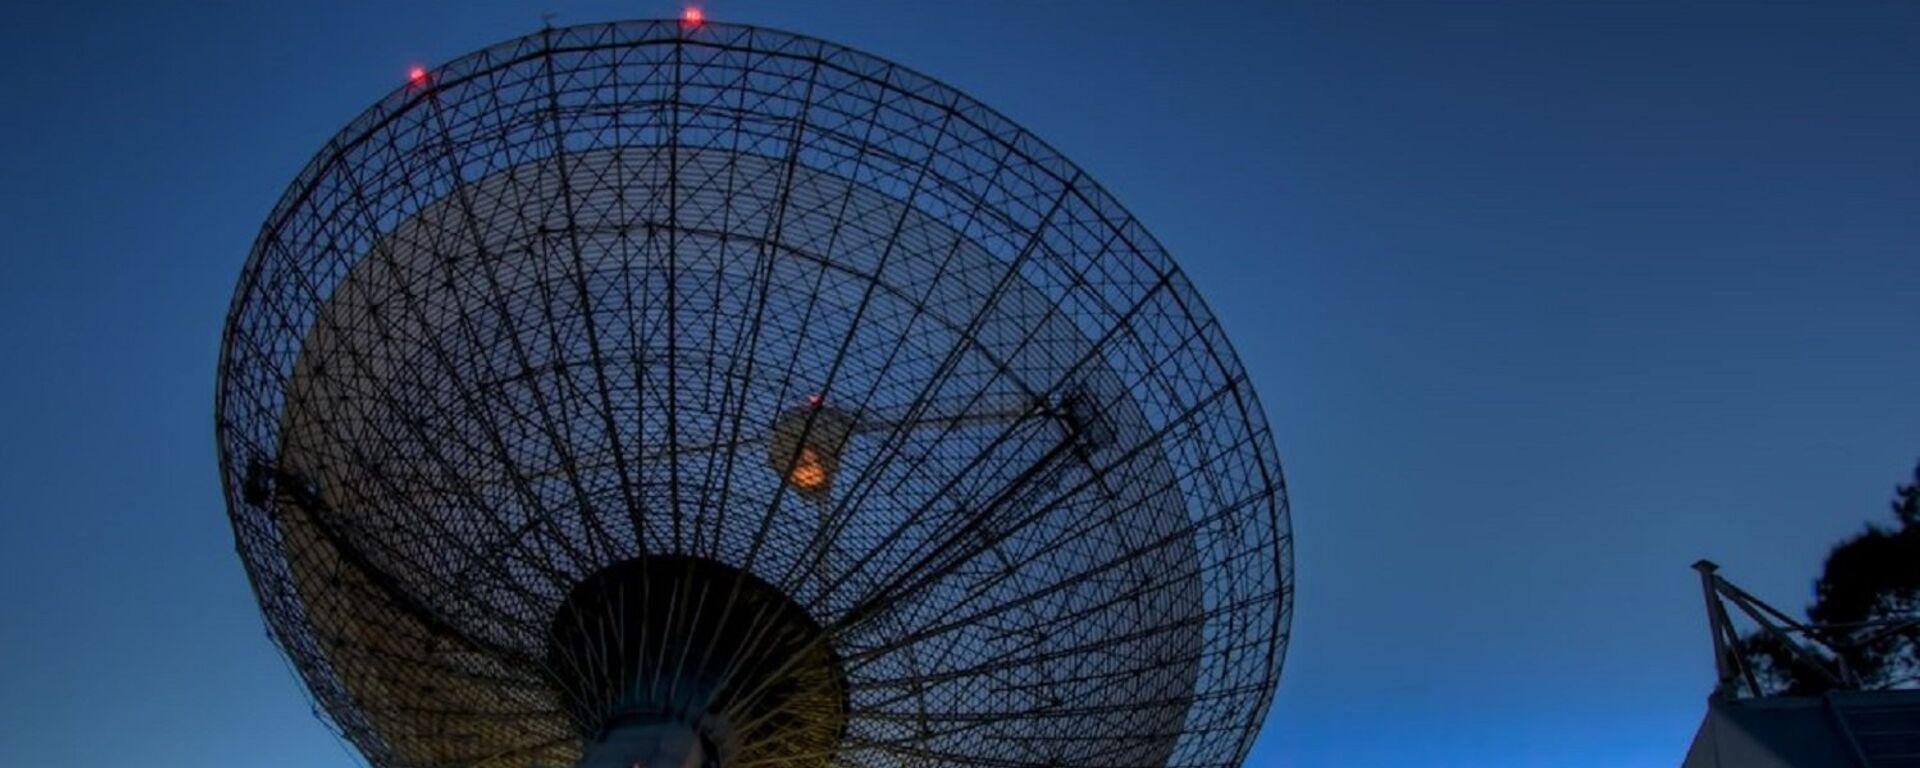 Parkes Radio Telescope - Sputnik Italia, 1920, 26.09.2017